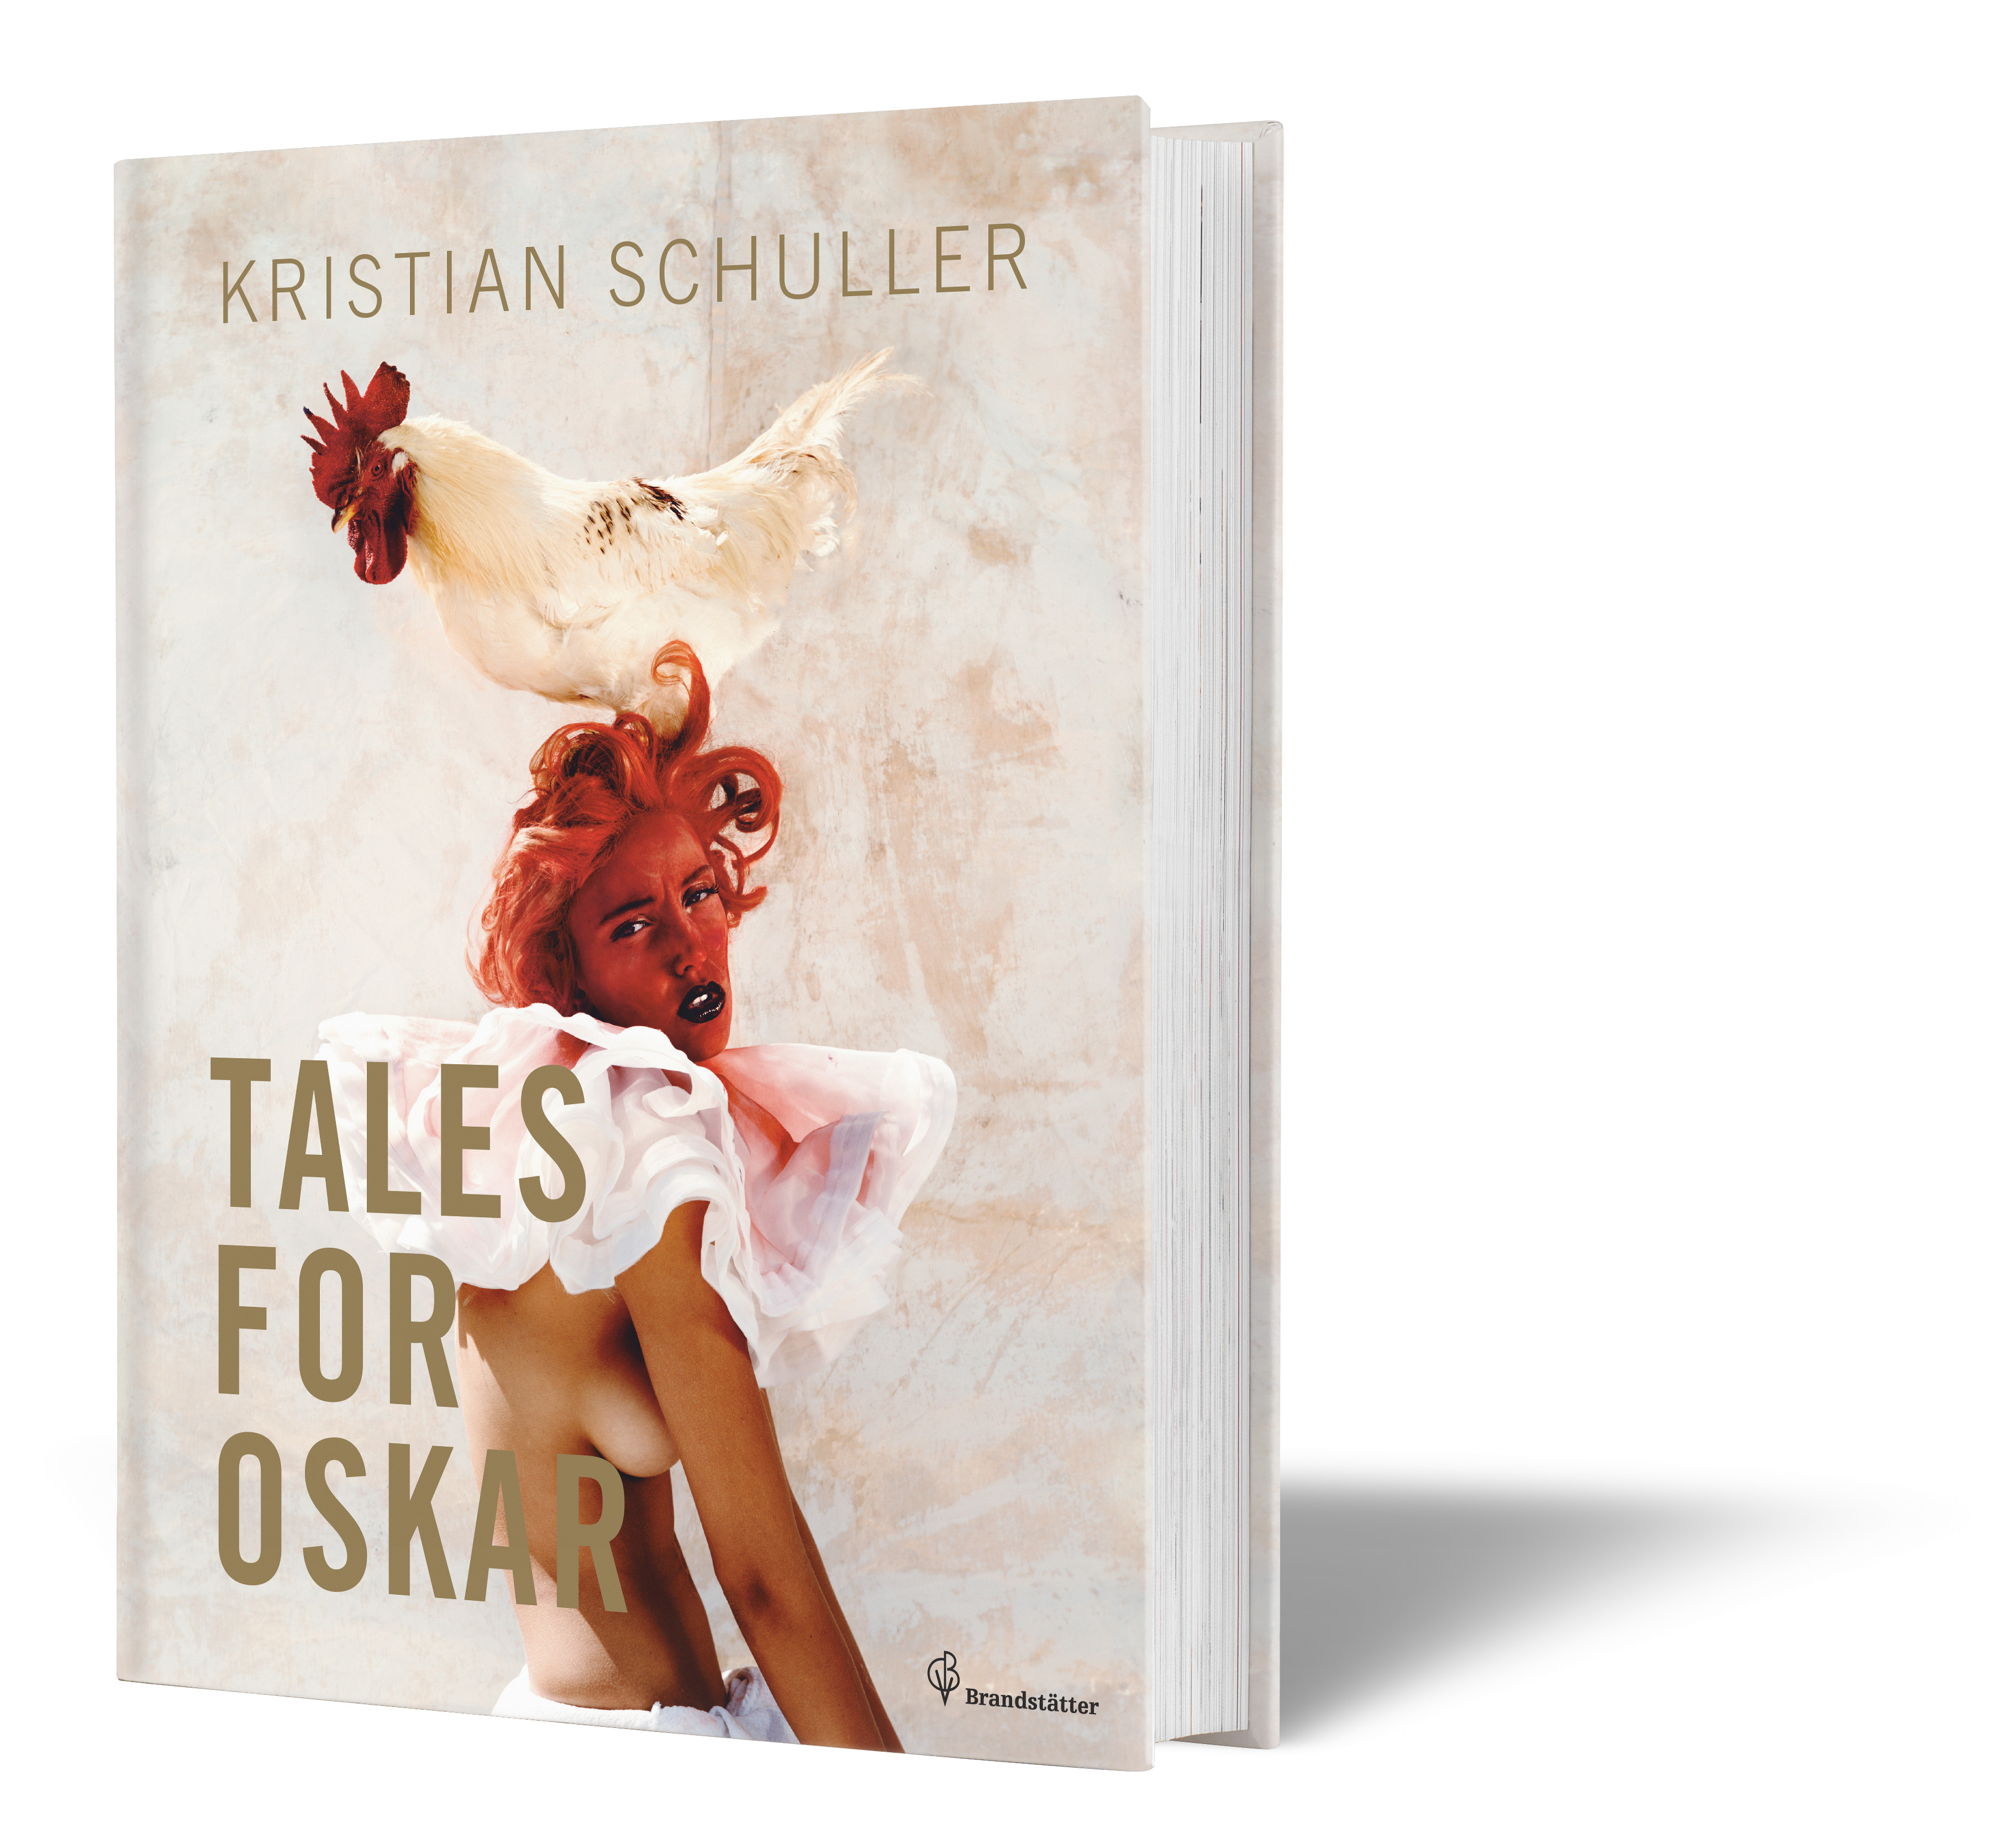 dc-book-kristian-schuller-tales-for-oscar